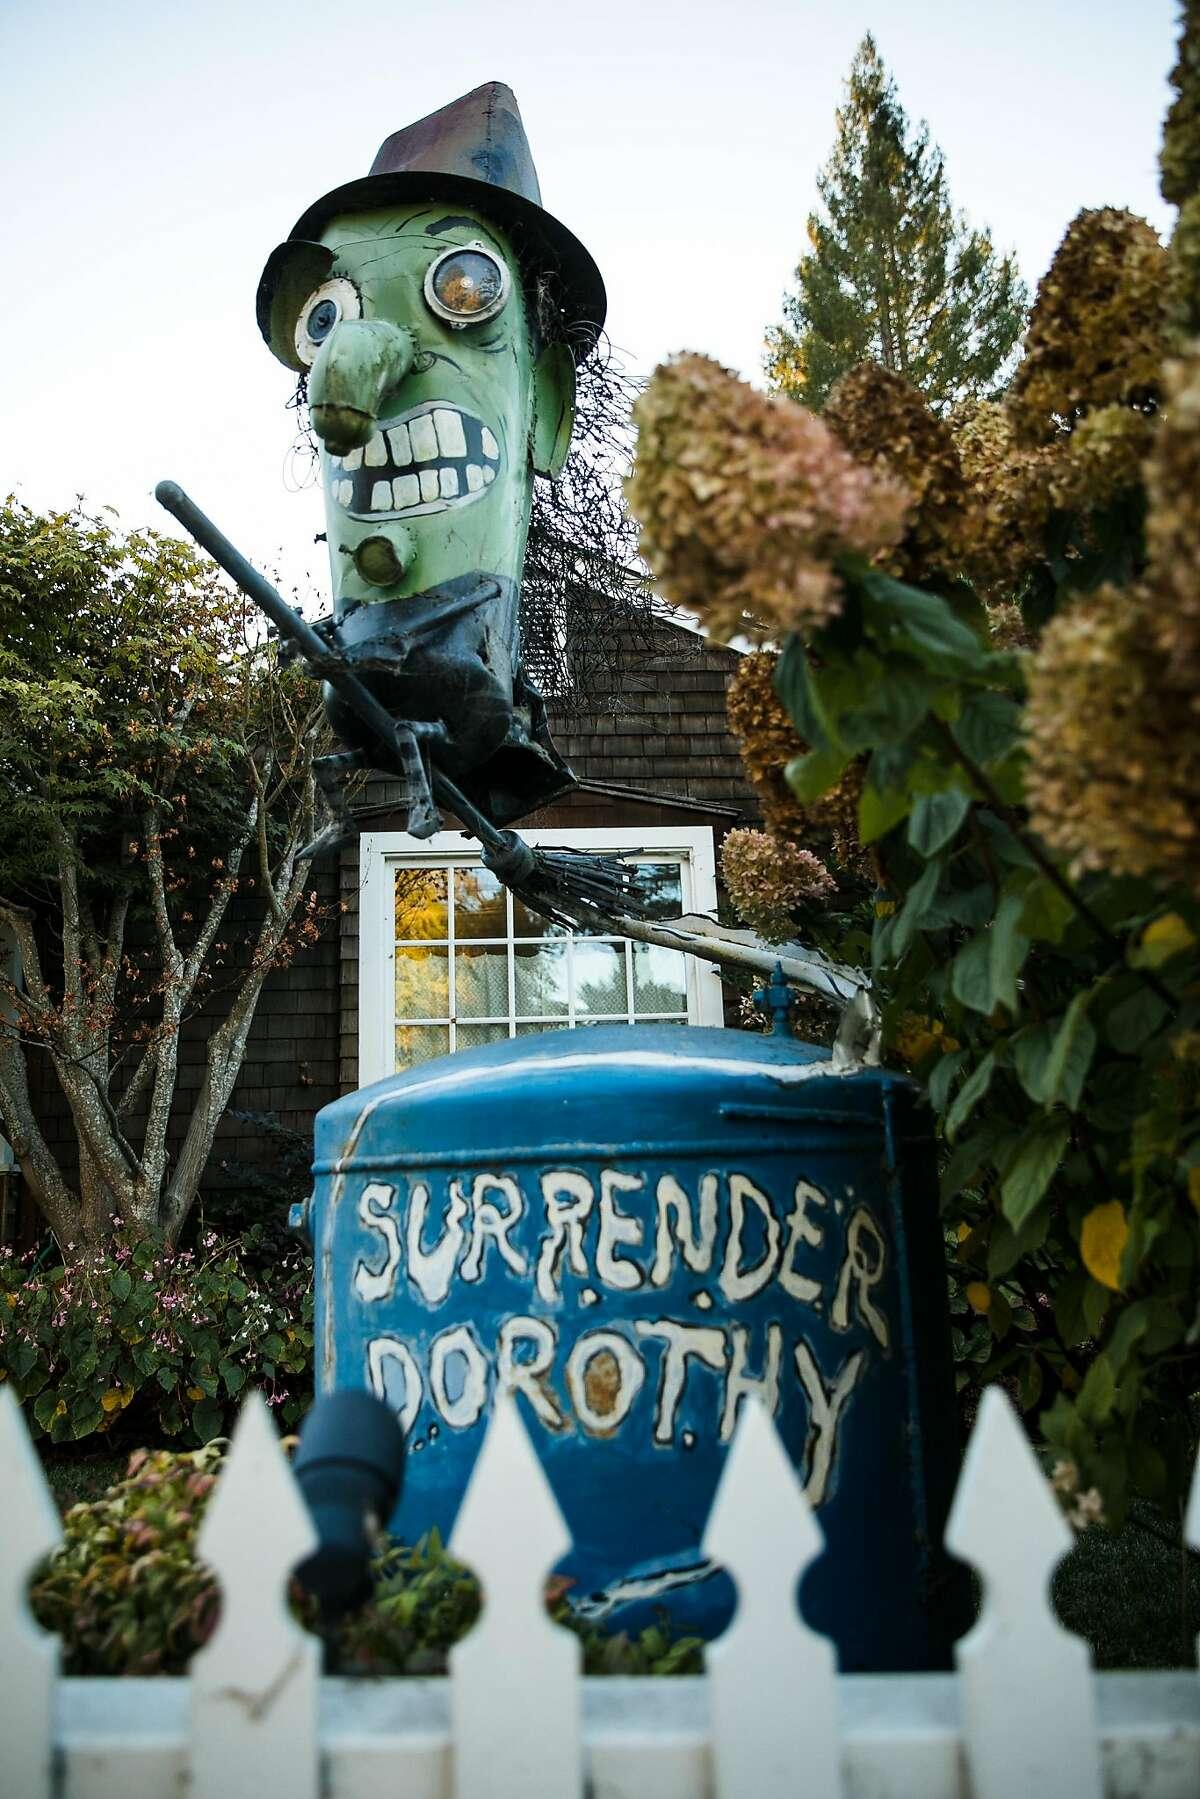 Surrender Dorothy statue photographed in Sebastopol, Calif. Wednesday, October 25, 2017.